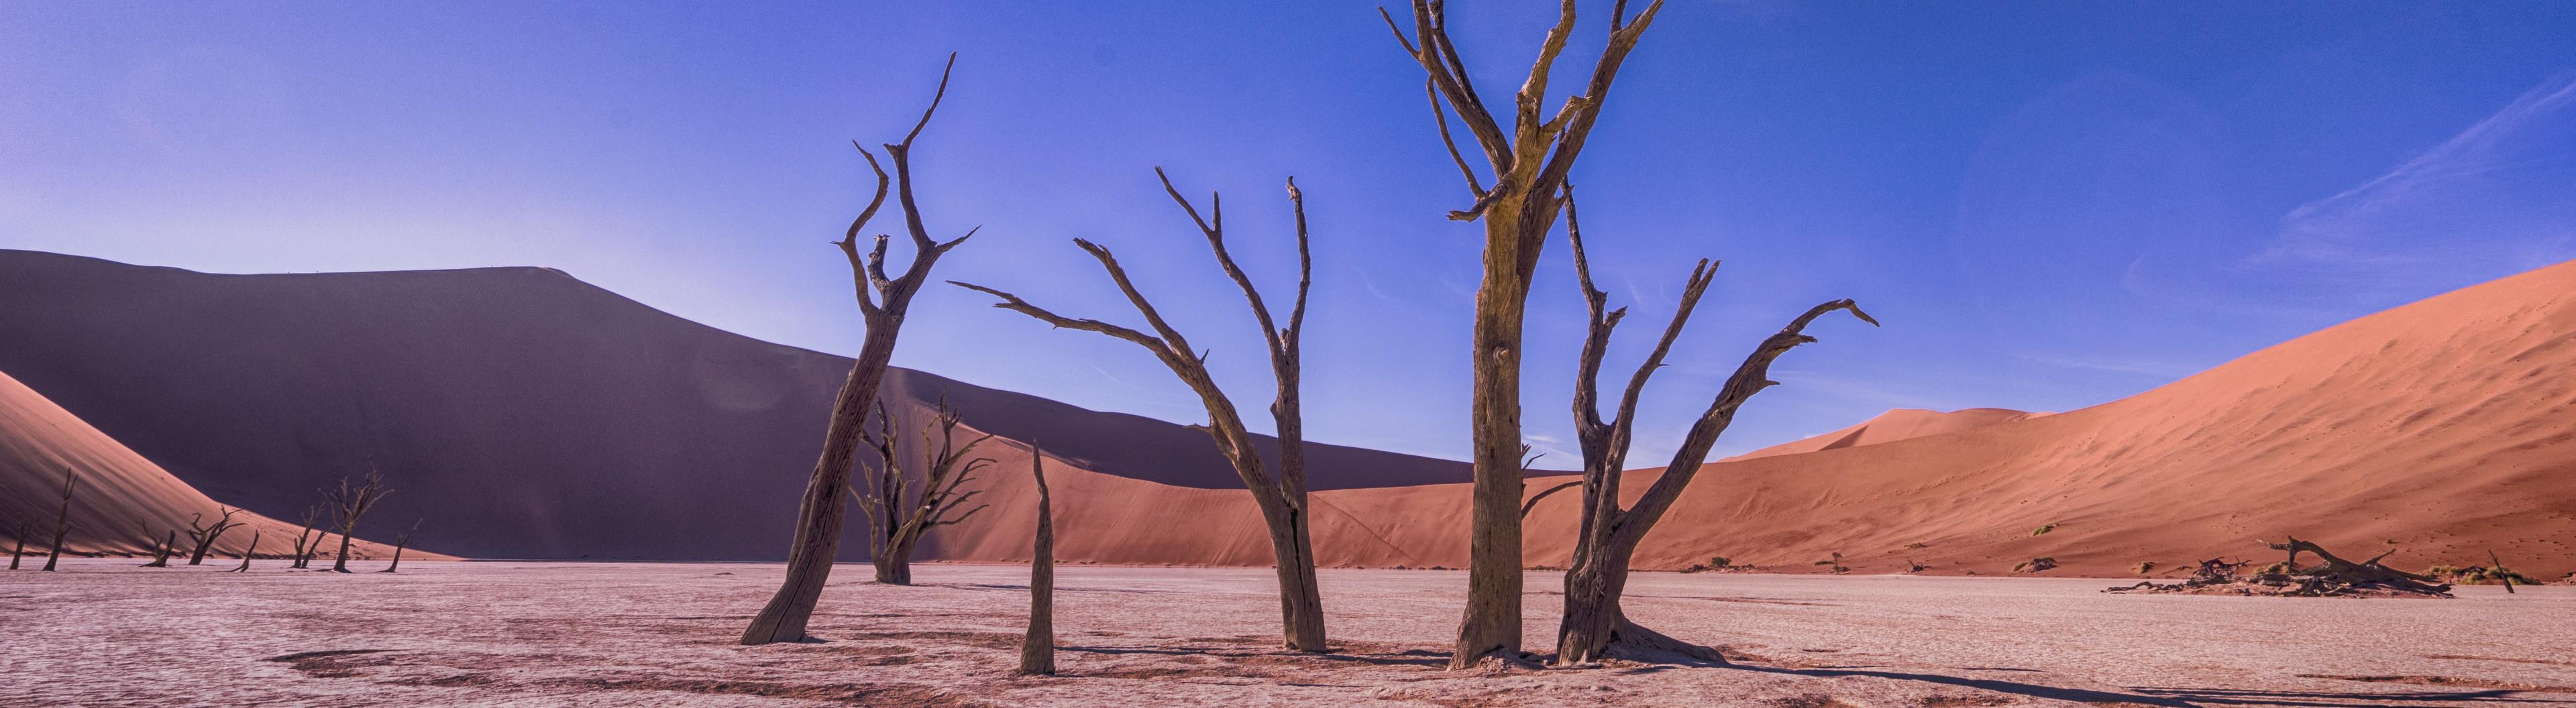 Vertrocknete Bäume in der Wüste vor blauem Himmel